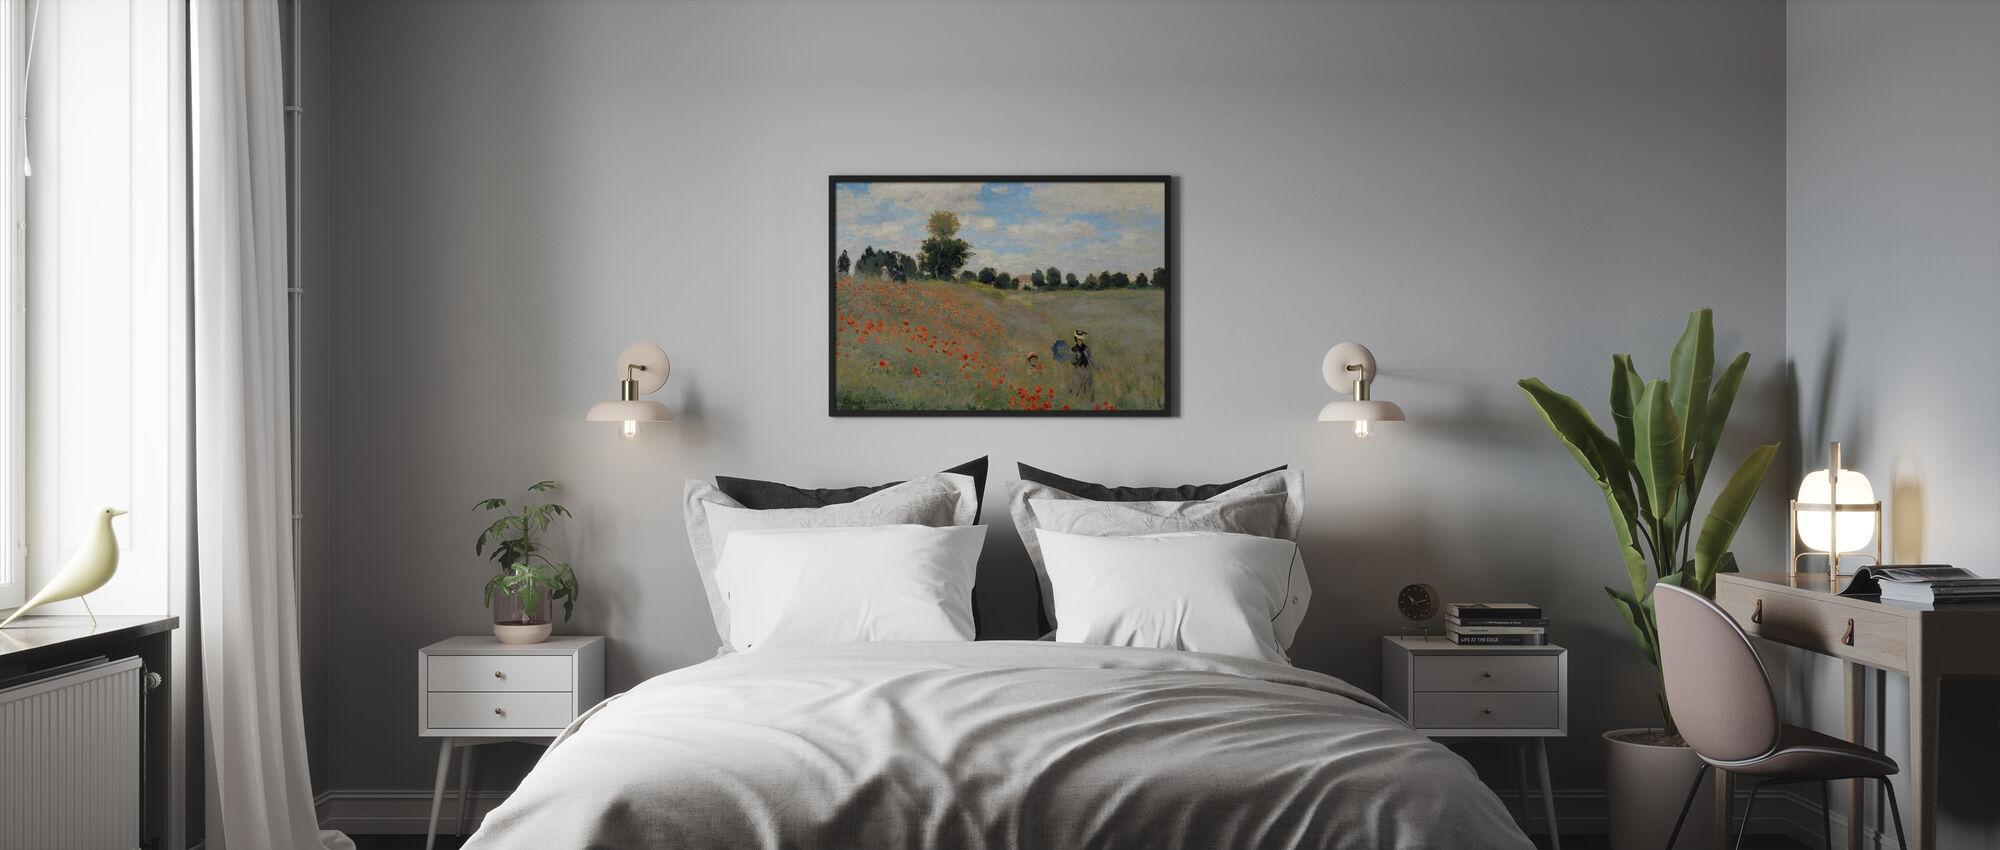 Vilde valmuer - Claude Monet - Plakat - Soveværelse